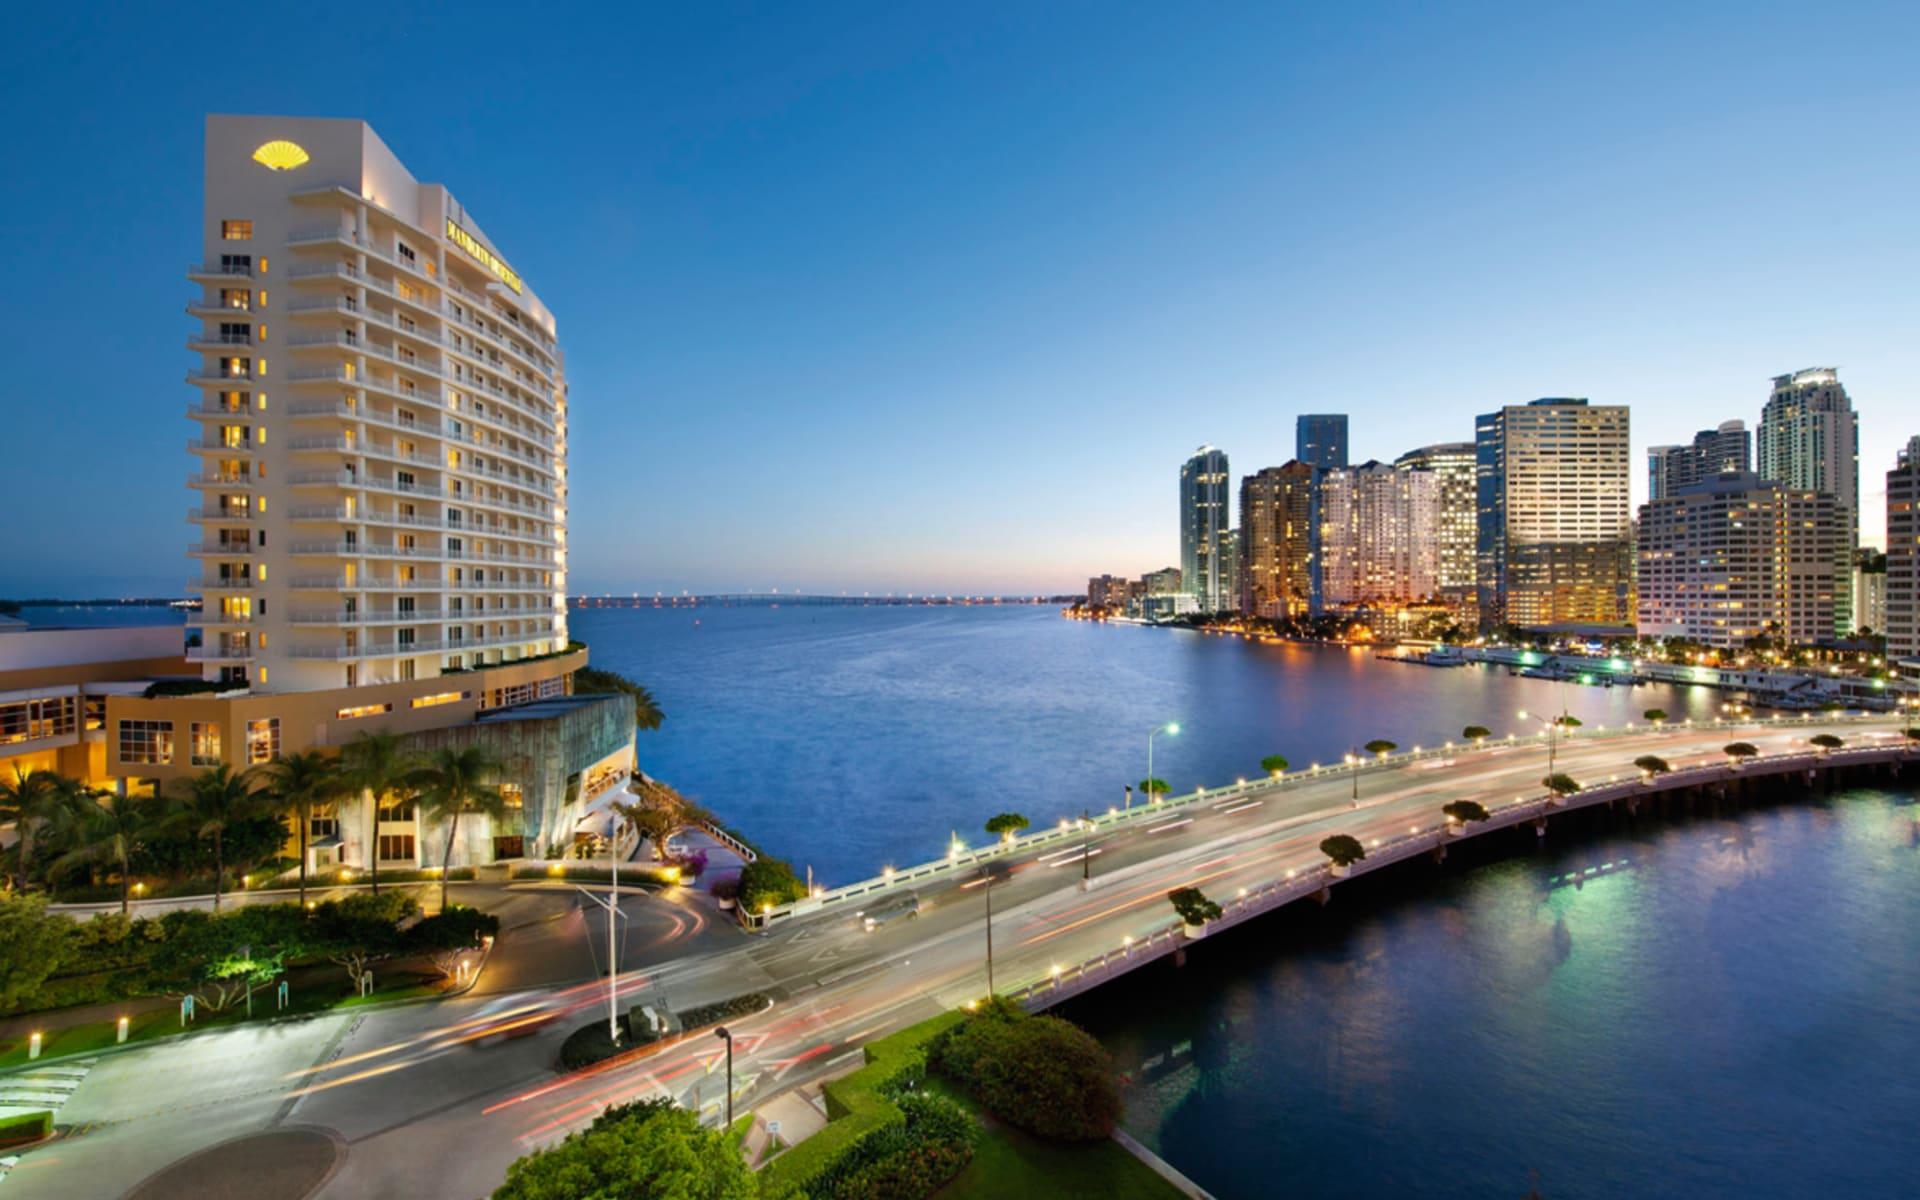 Mandarin Oriental Miami: exterior mandarin oriental miami hotelansicht brücke meer